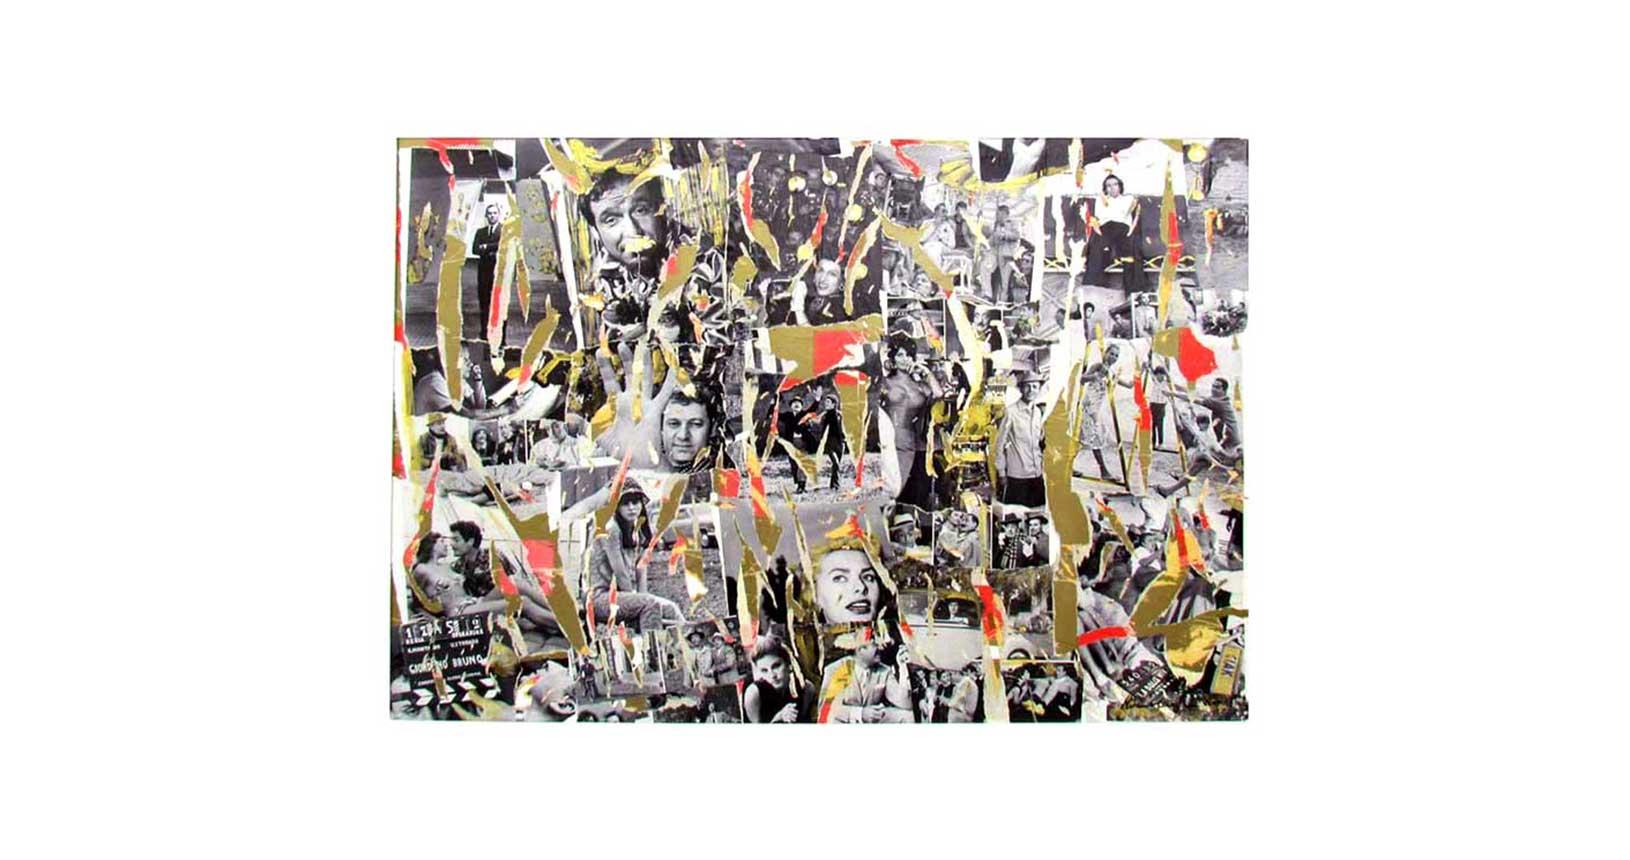 art vintage iconic design furniture riccardo serafini mimmo rotella jacques villeglè arte contemporanea street art raymond hains cinecittArt cinecittà cinema roma sophia loren totò